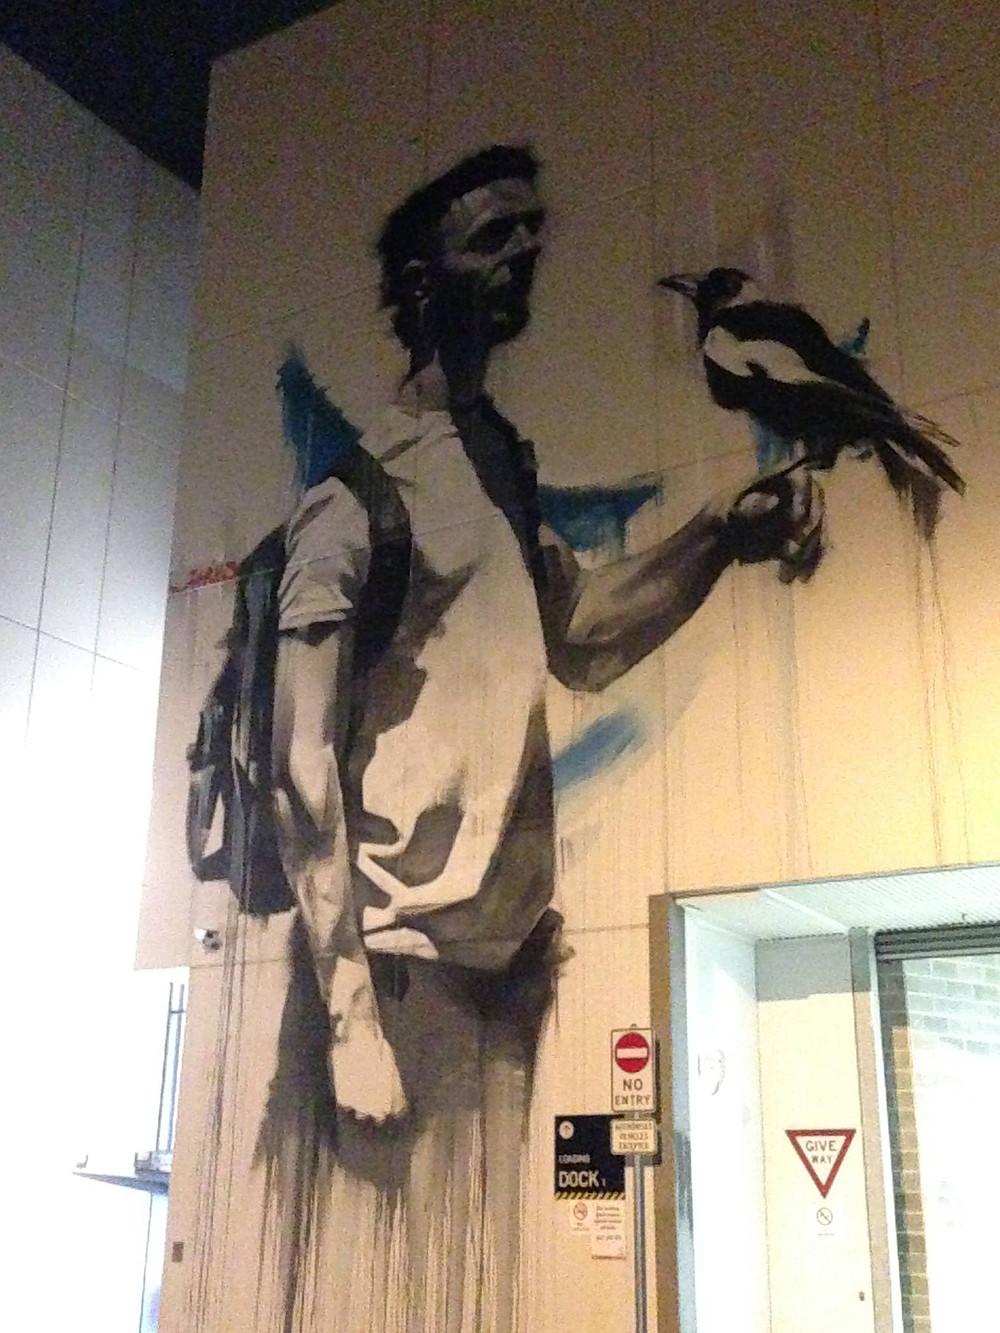 street art man with bird